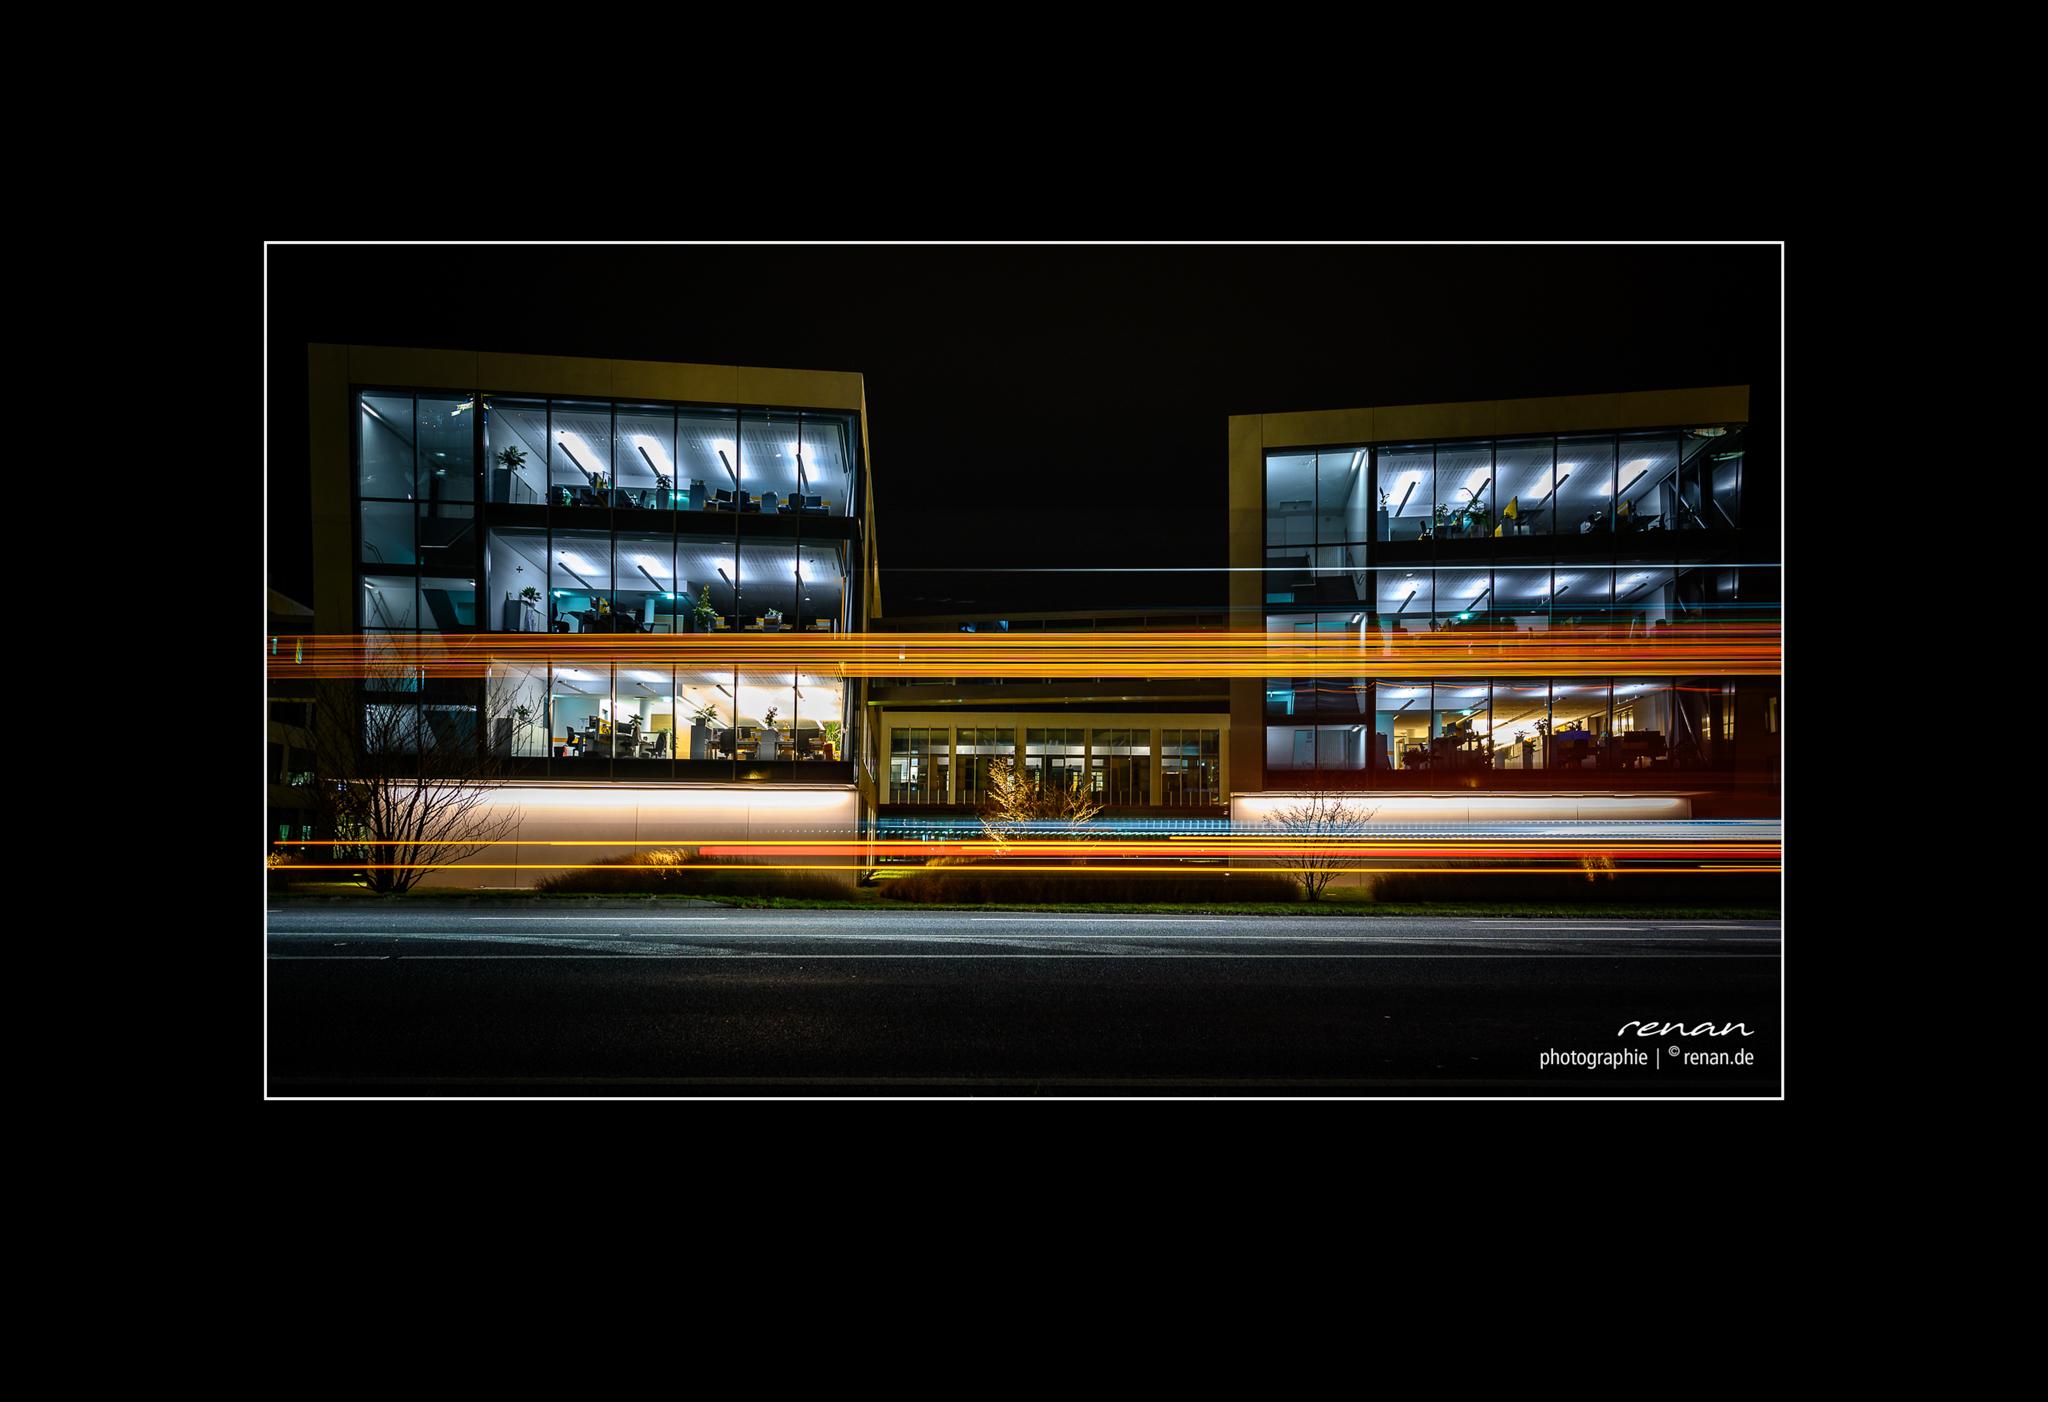 2020-02-25-street-night-7